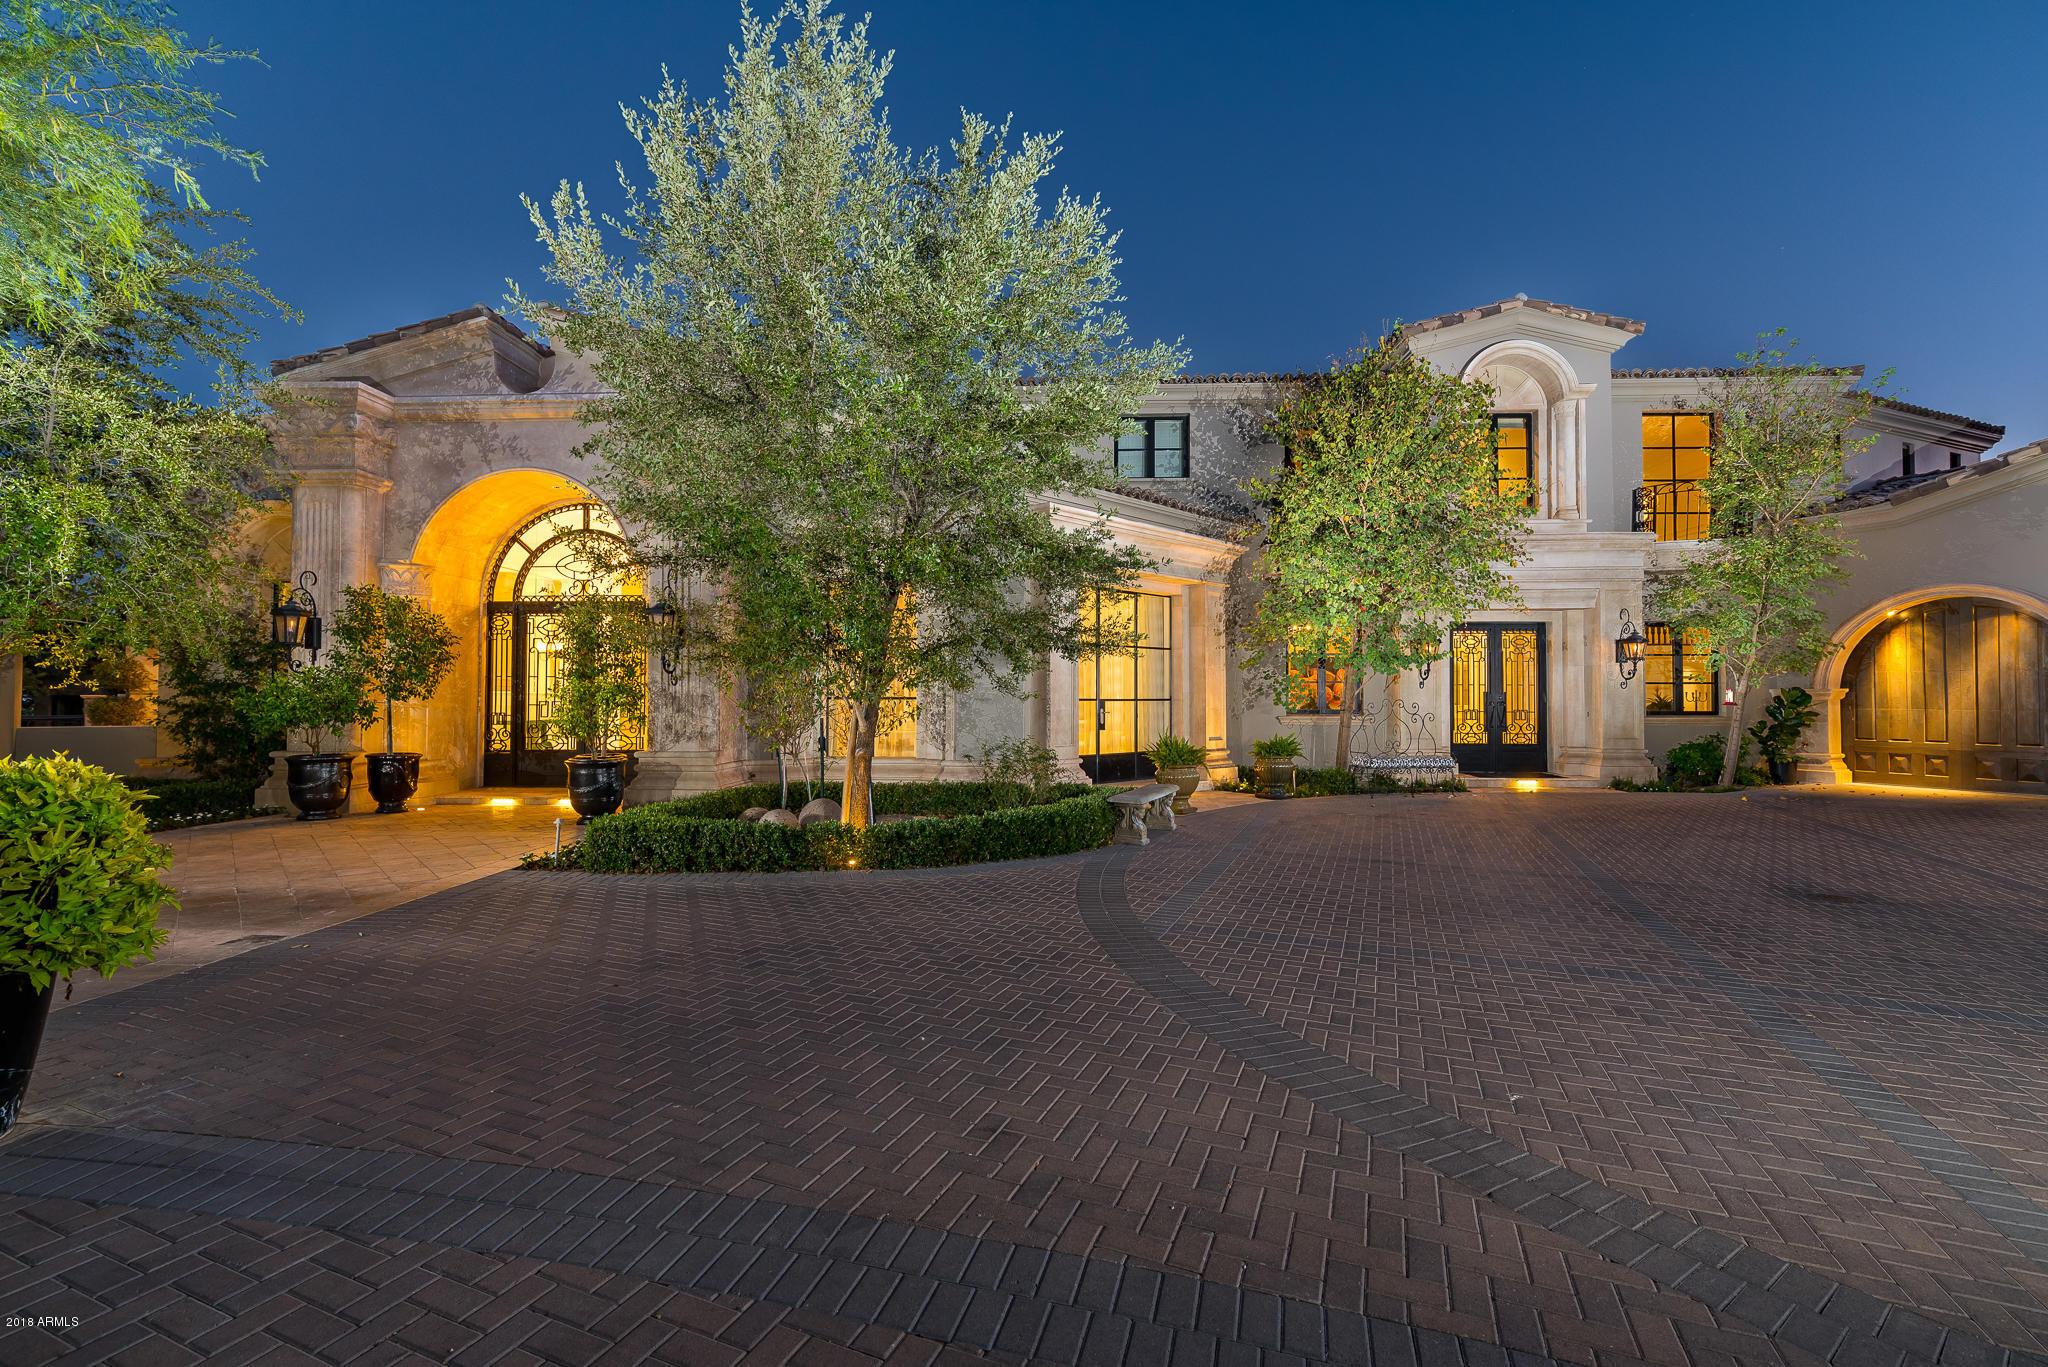 MLS 5860073 Paradise Valley Metro Area, Paradise Valley, AZ 85253 Paradise Valley AZ Private Pool